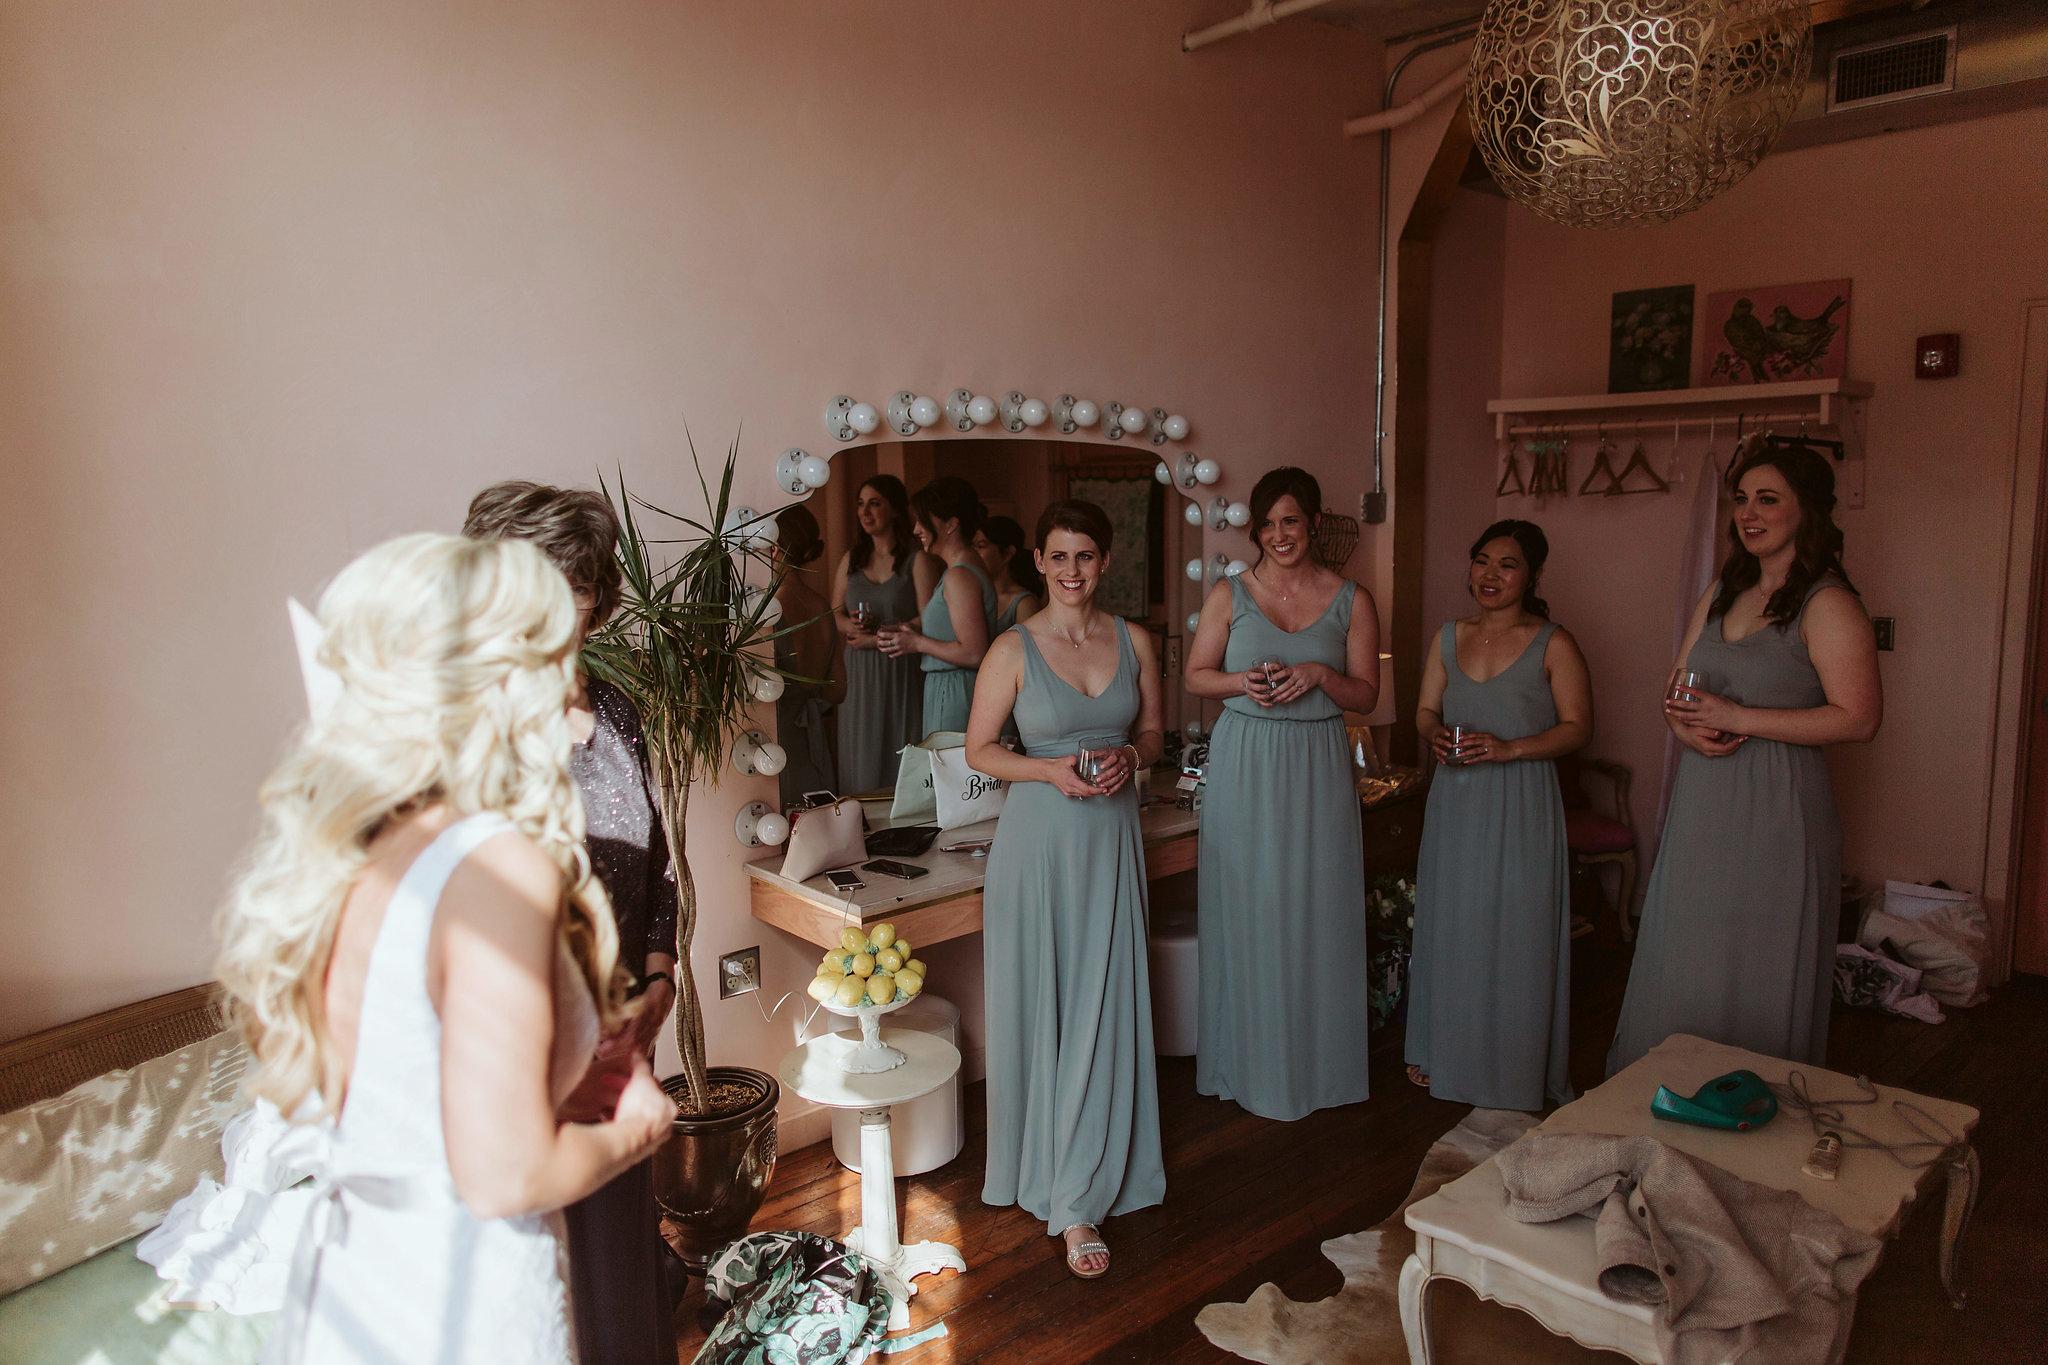 The Bride and The Bauer Wedding_Cinder Block Brewery Wedding_Kindling Wedding Photography_06.JPG